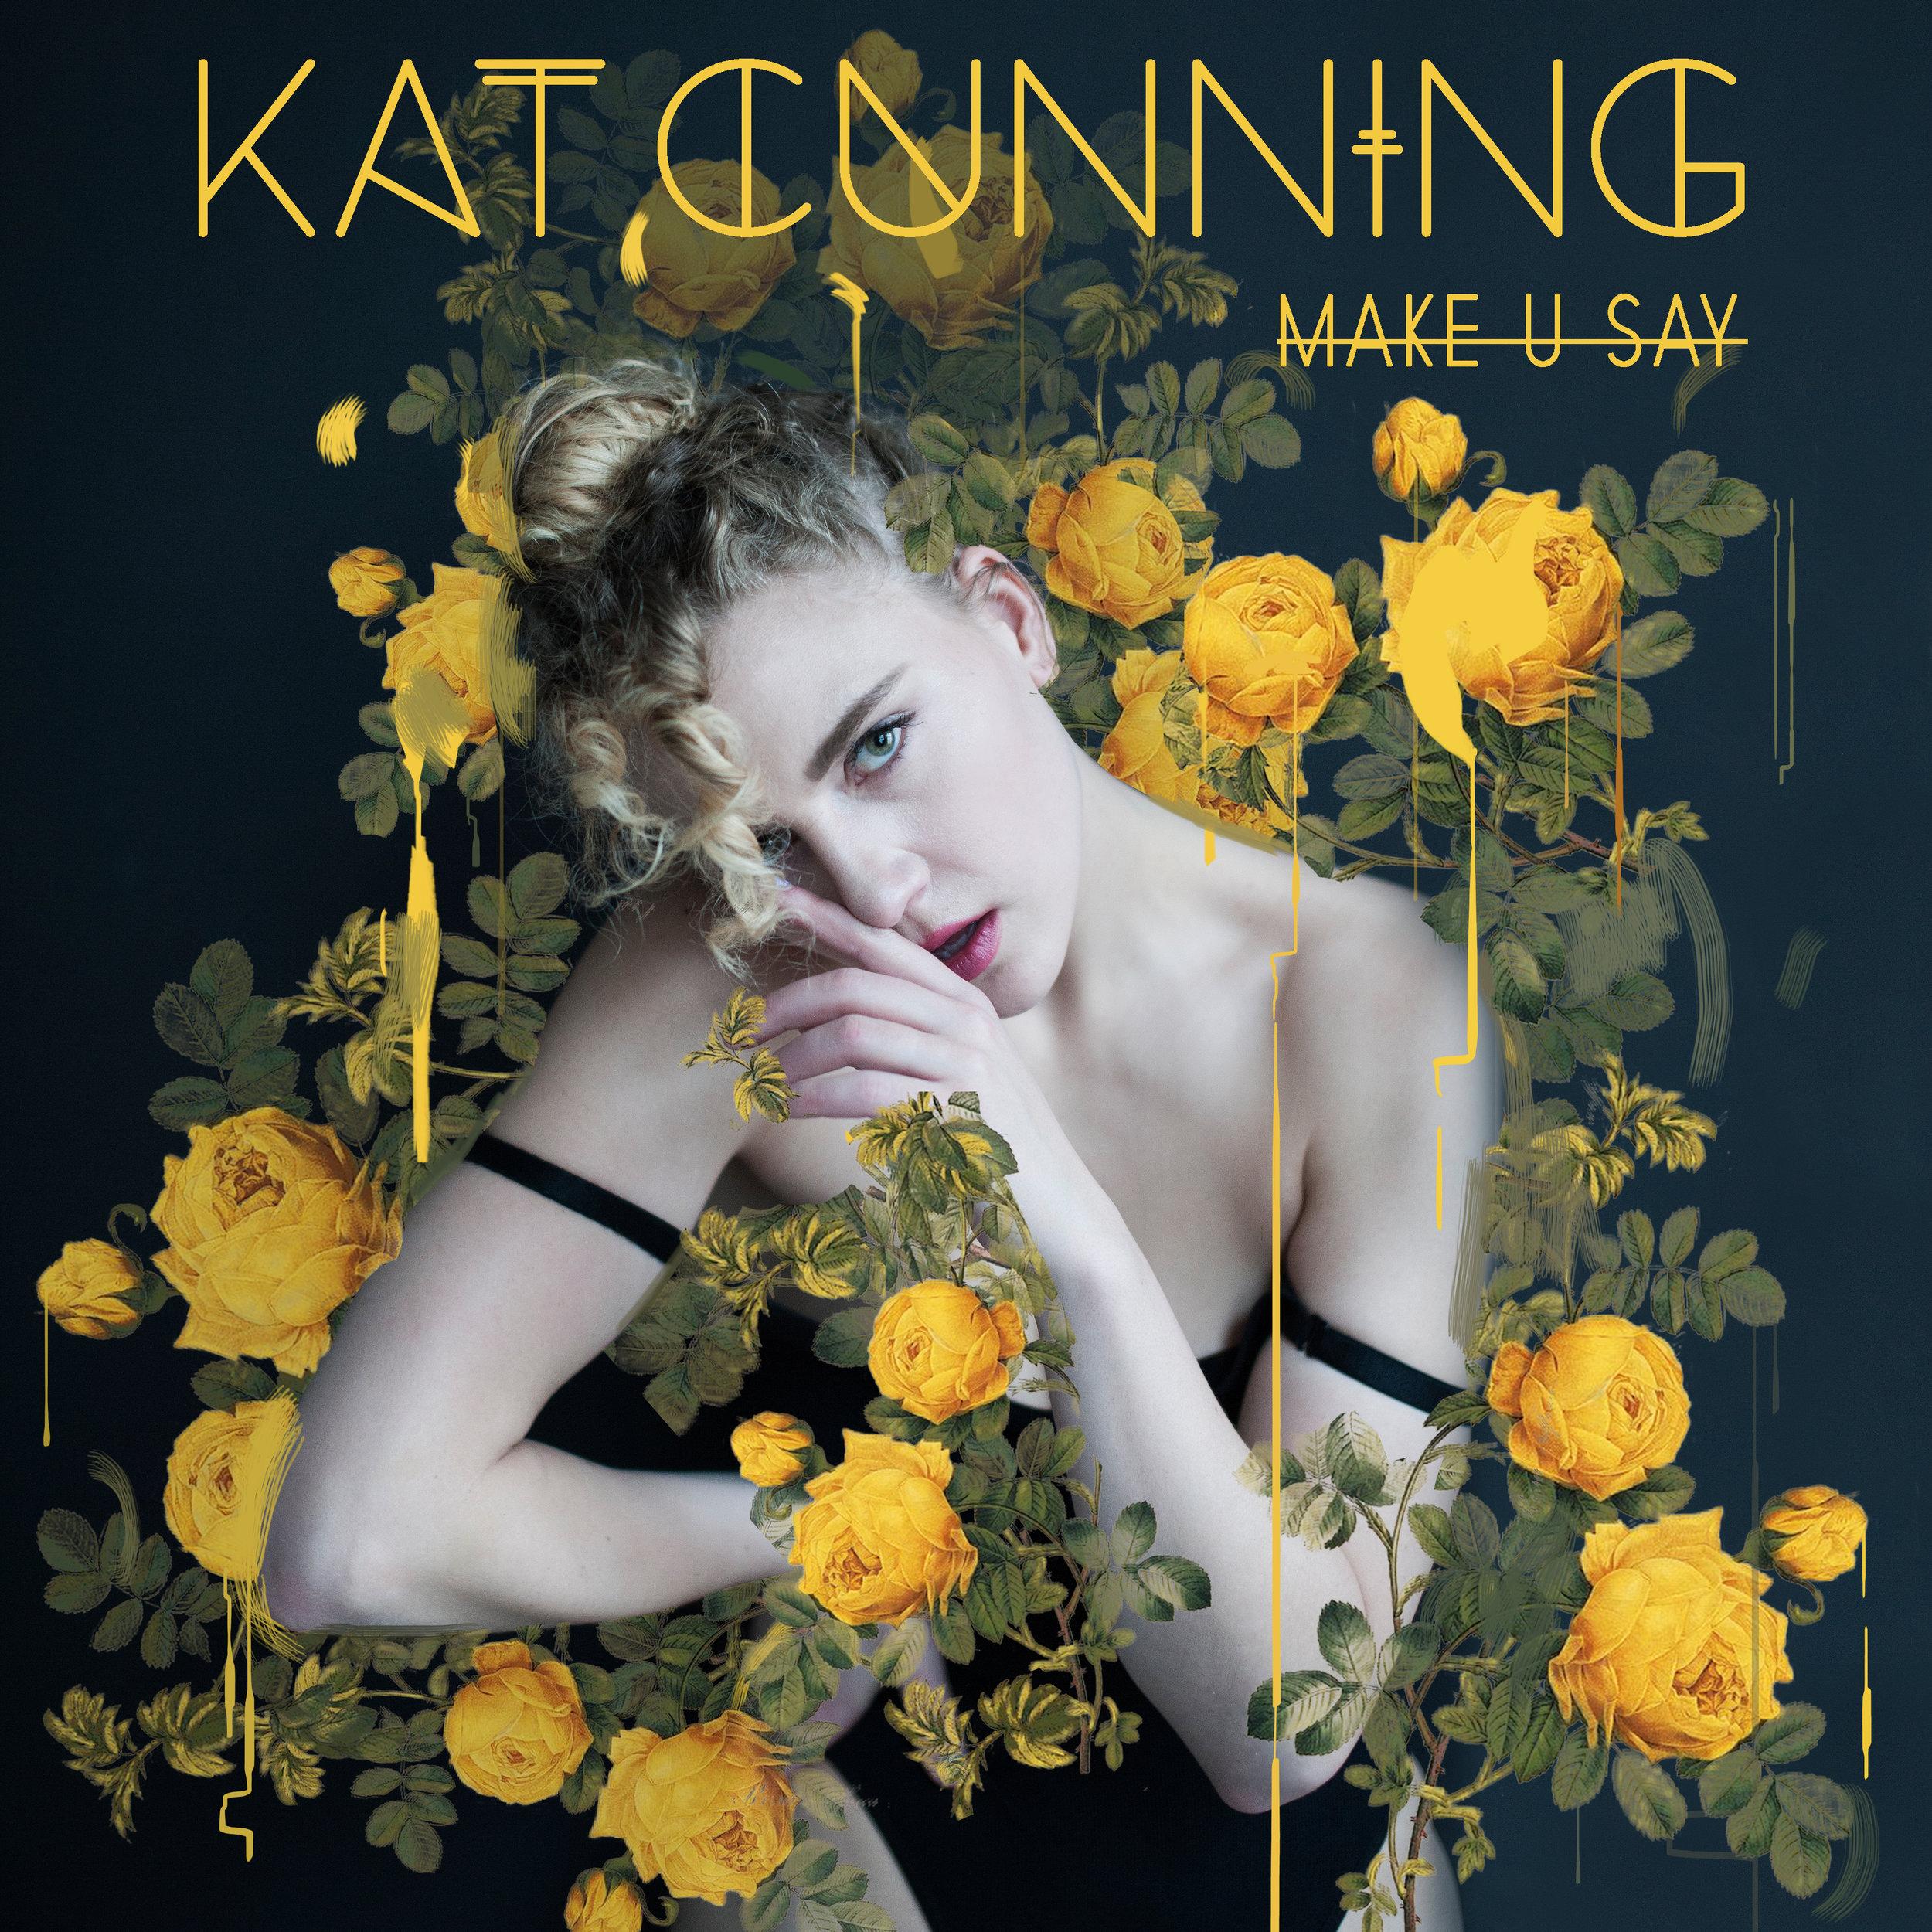 KAT_CUNNING_MAKE_U_SAY_COVER_FINAL.jpg